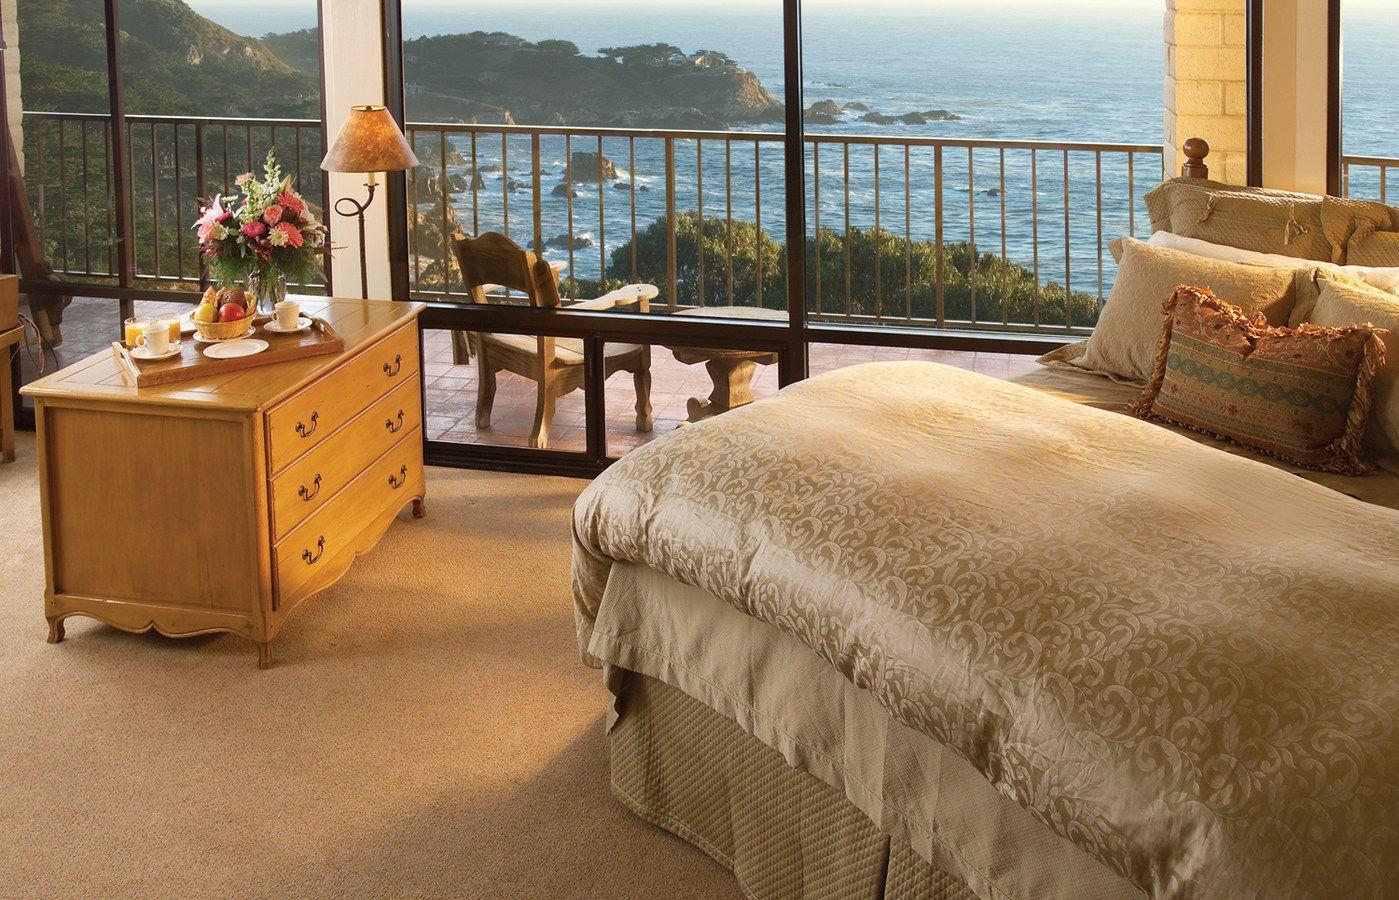 Luxury Hotels Carmel Ca Tickle Pink Inn Sur California